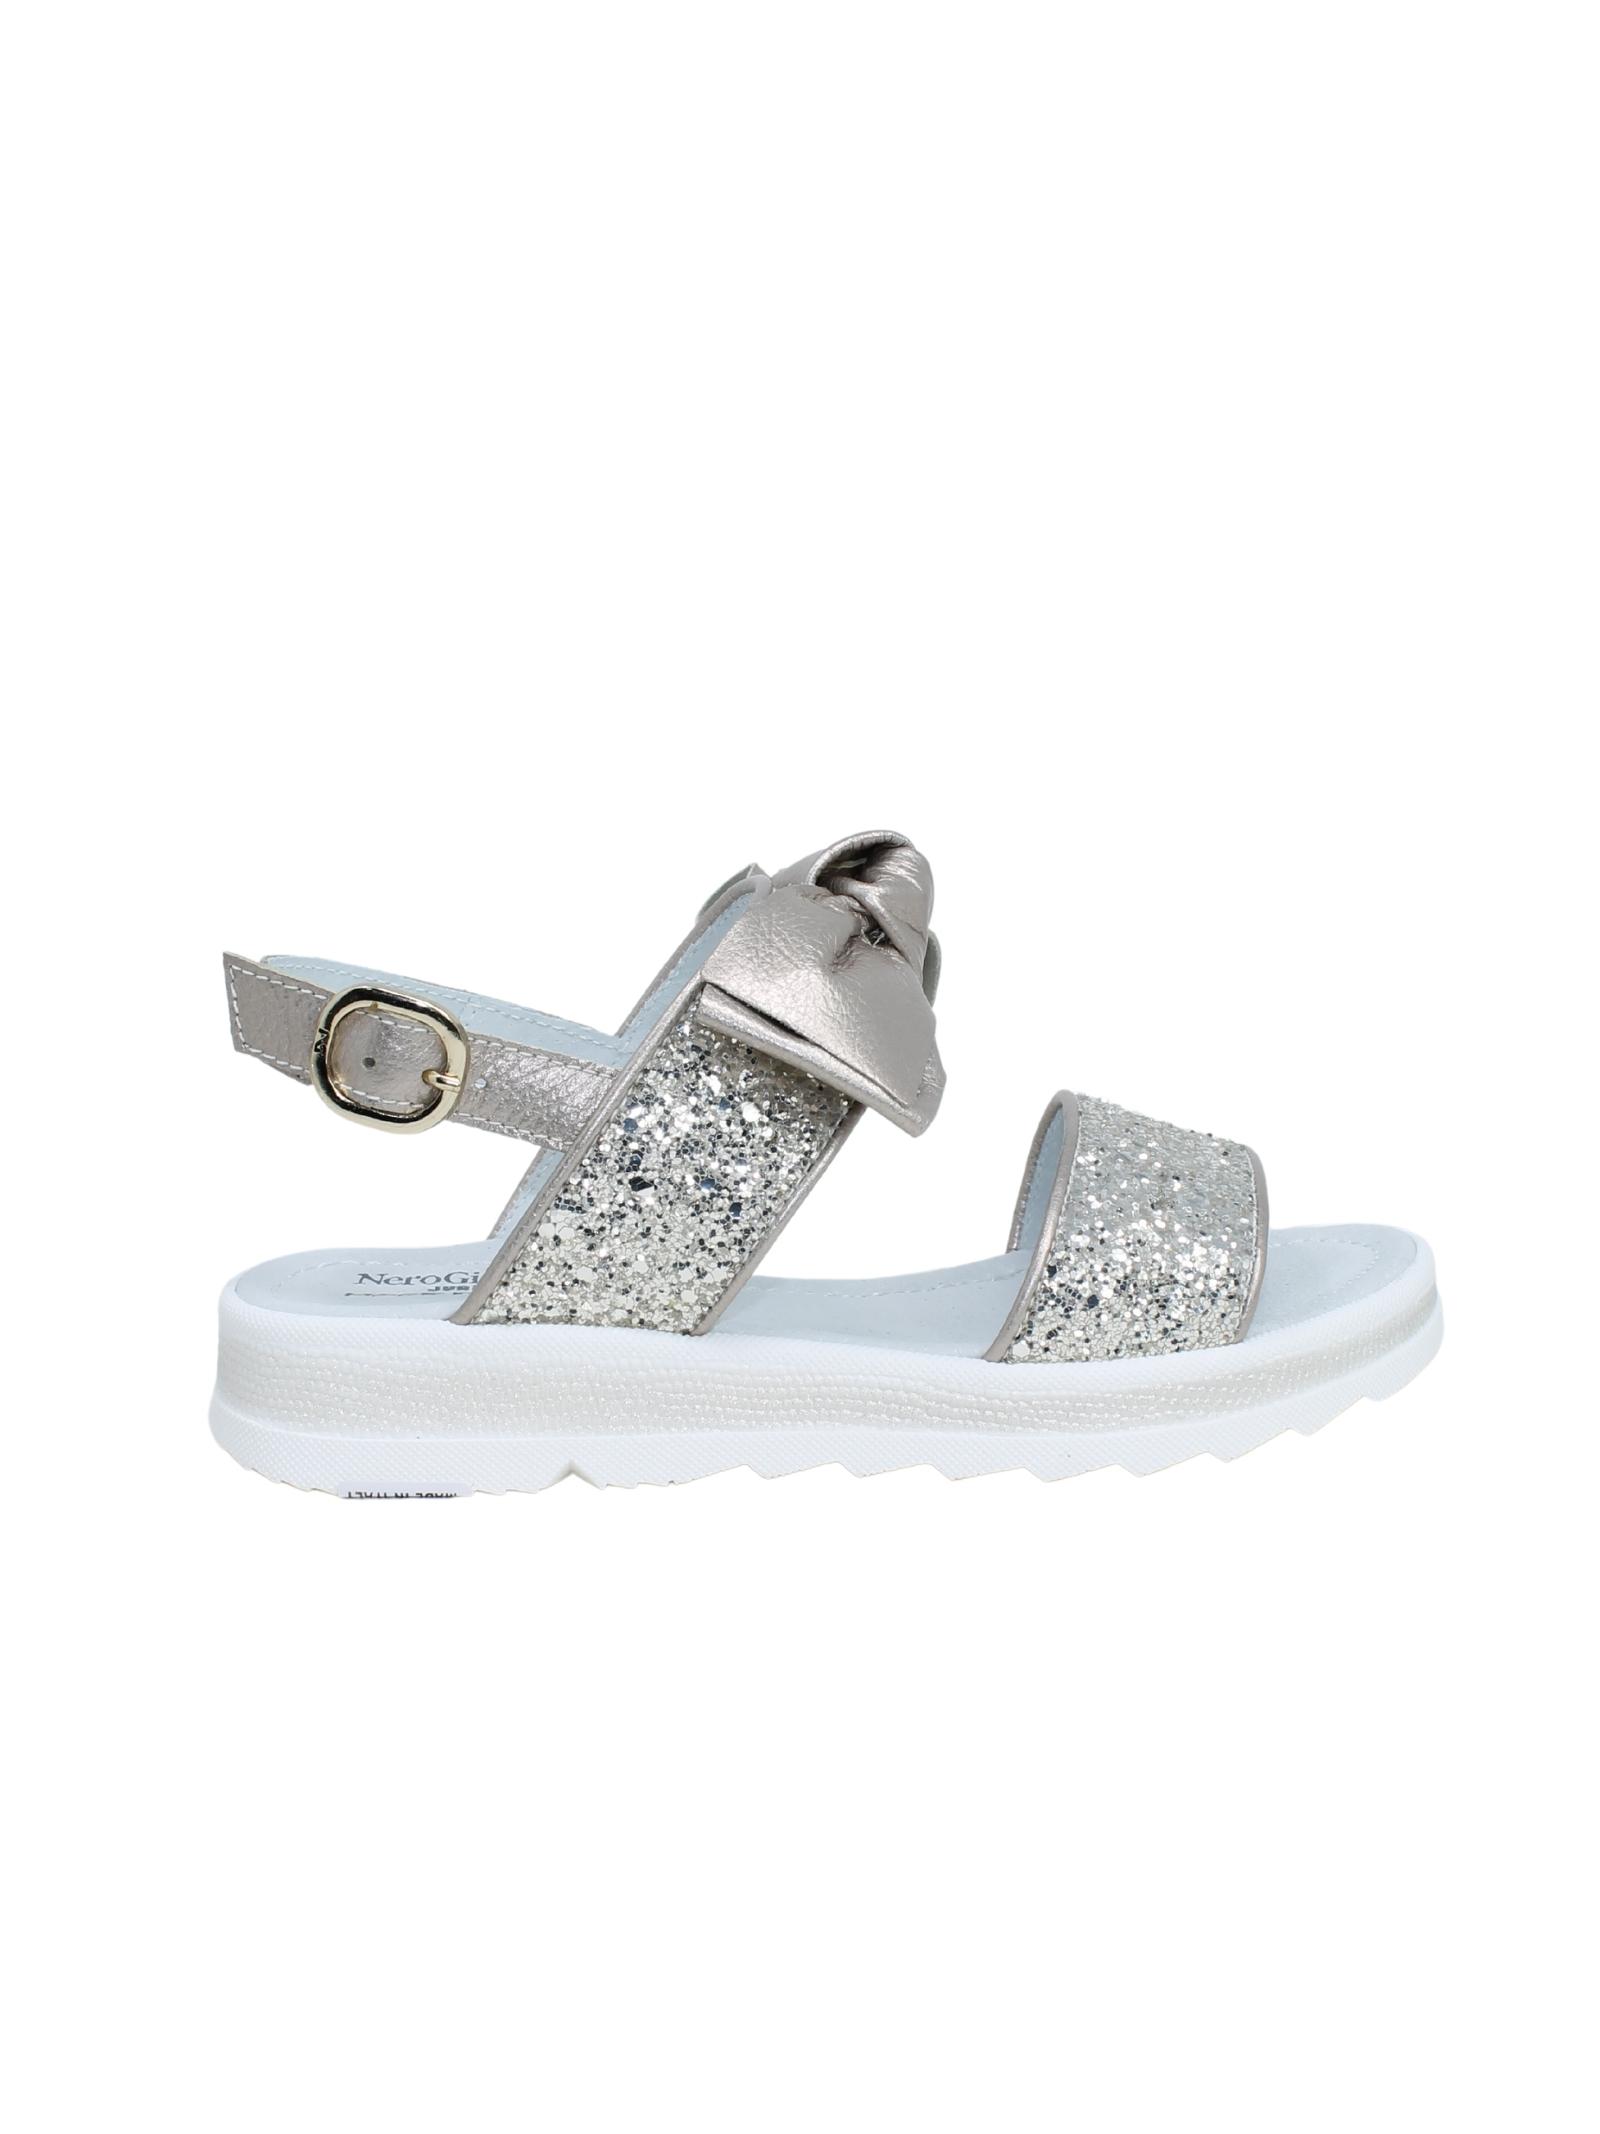 Sandalo Bambina Glitter NERO GIARDINI JUNIOR | Sandali | E031600F414